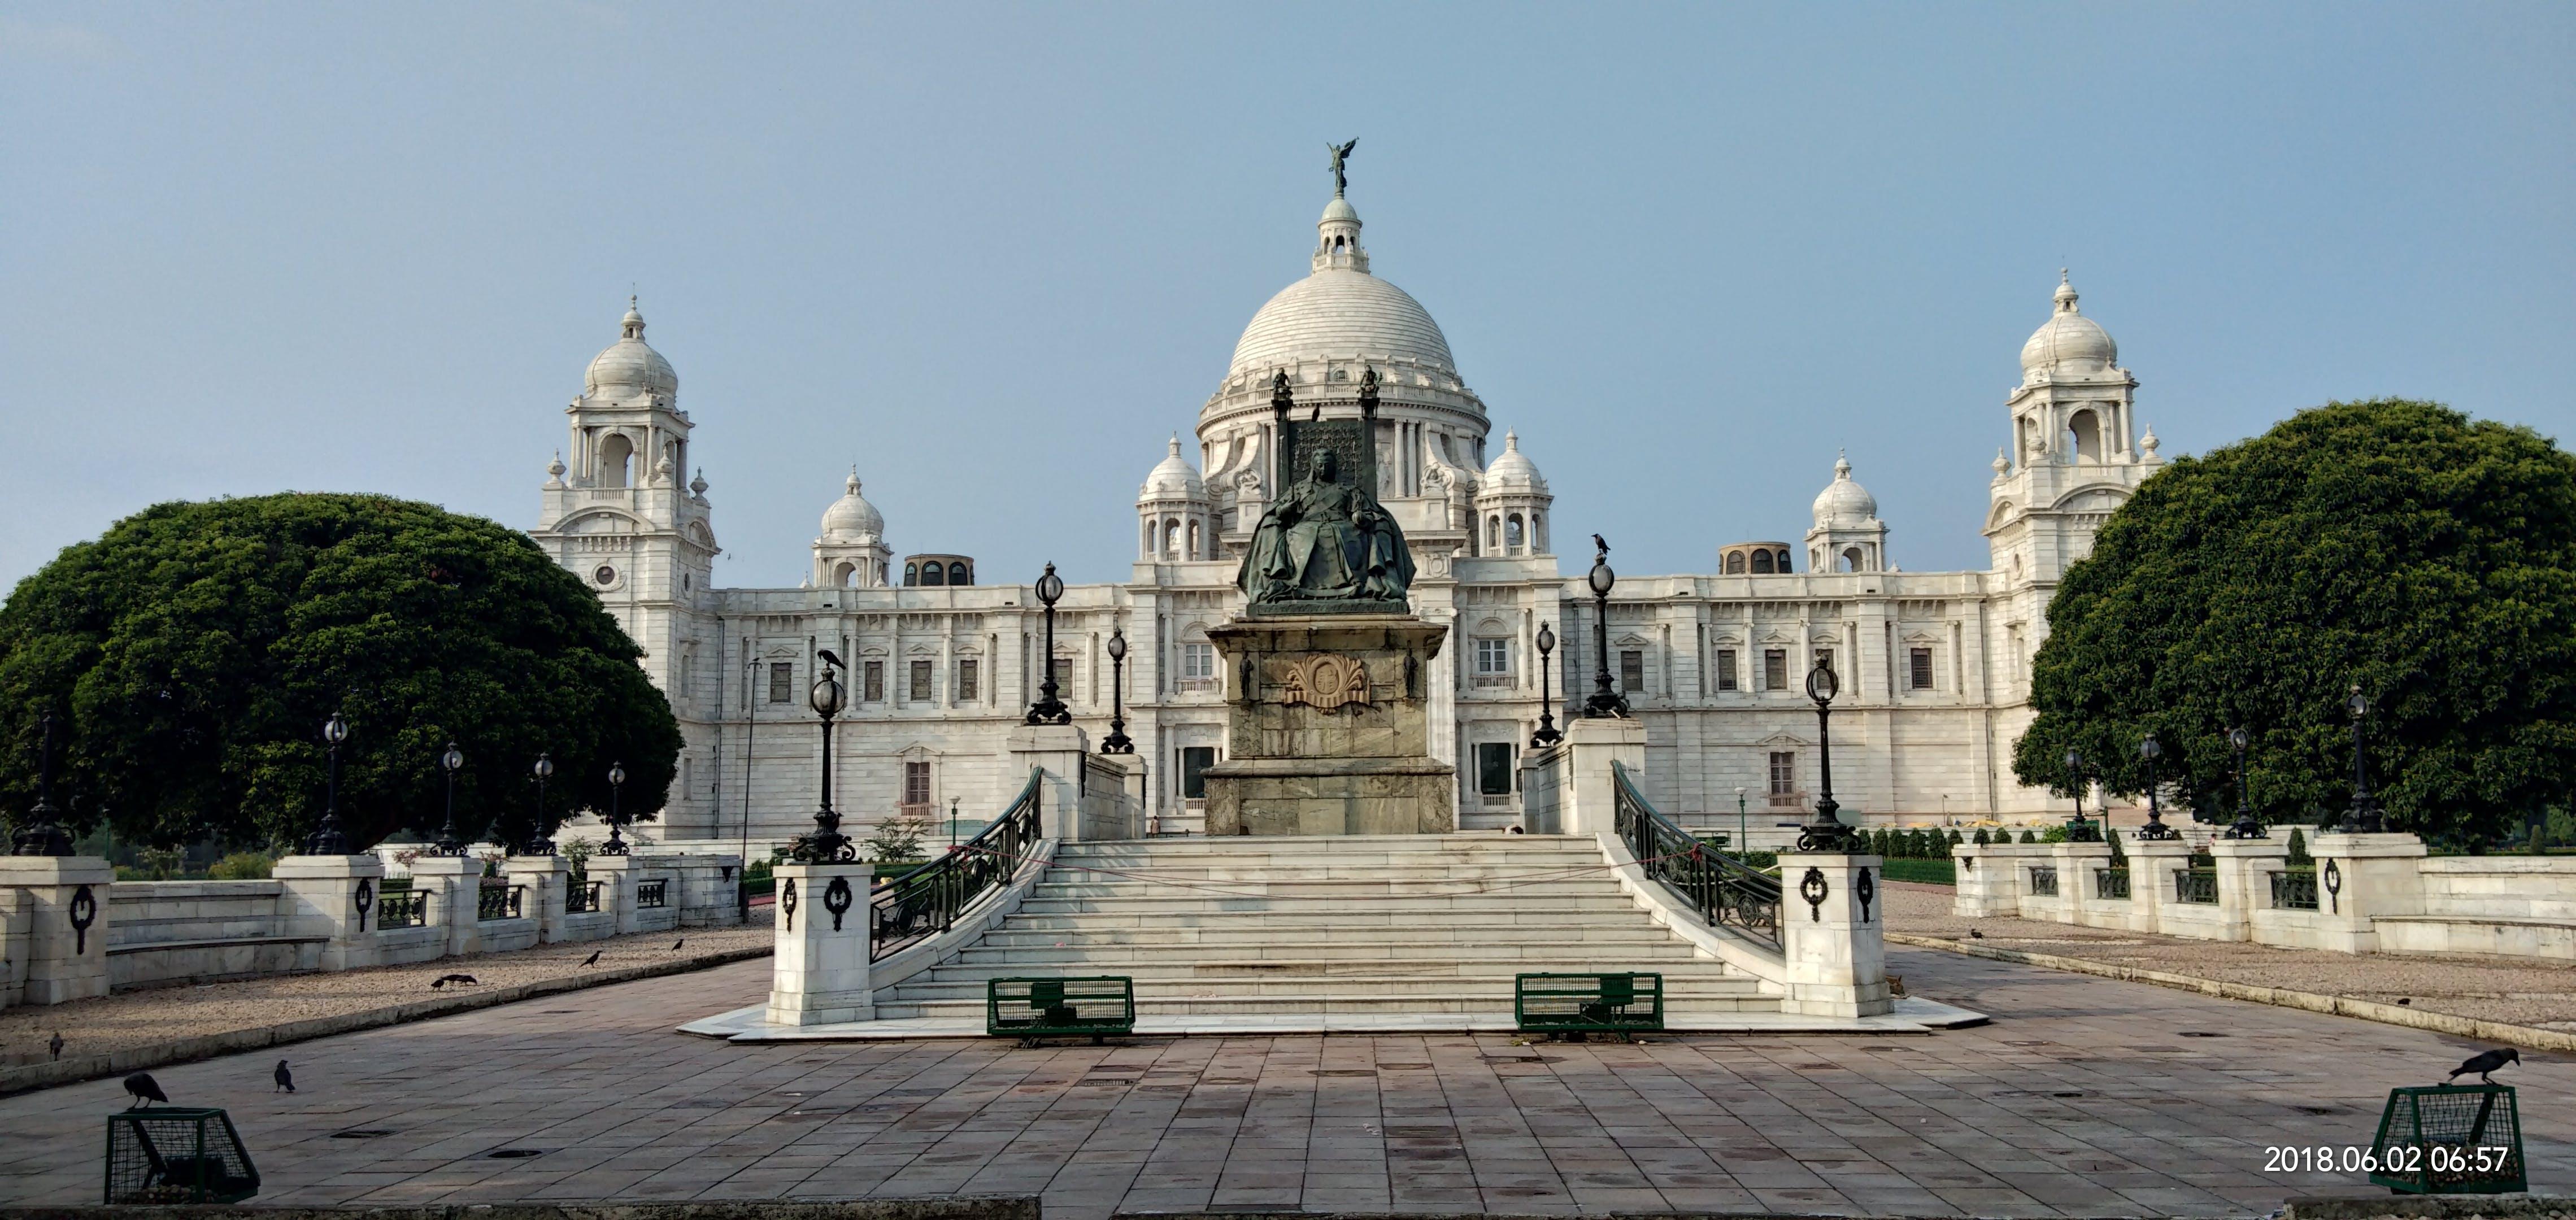 Free stock photo of Victoria memorial